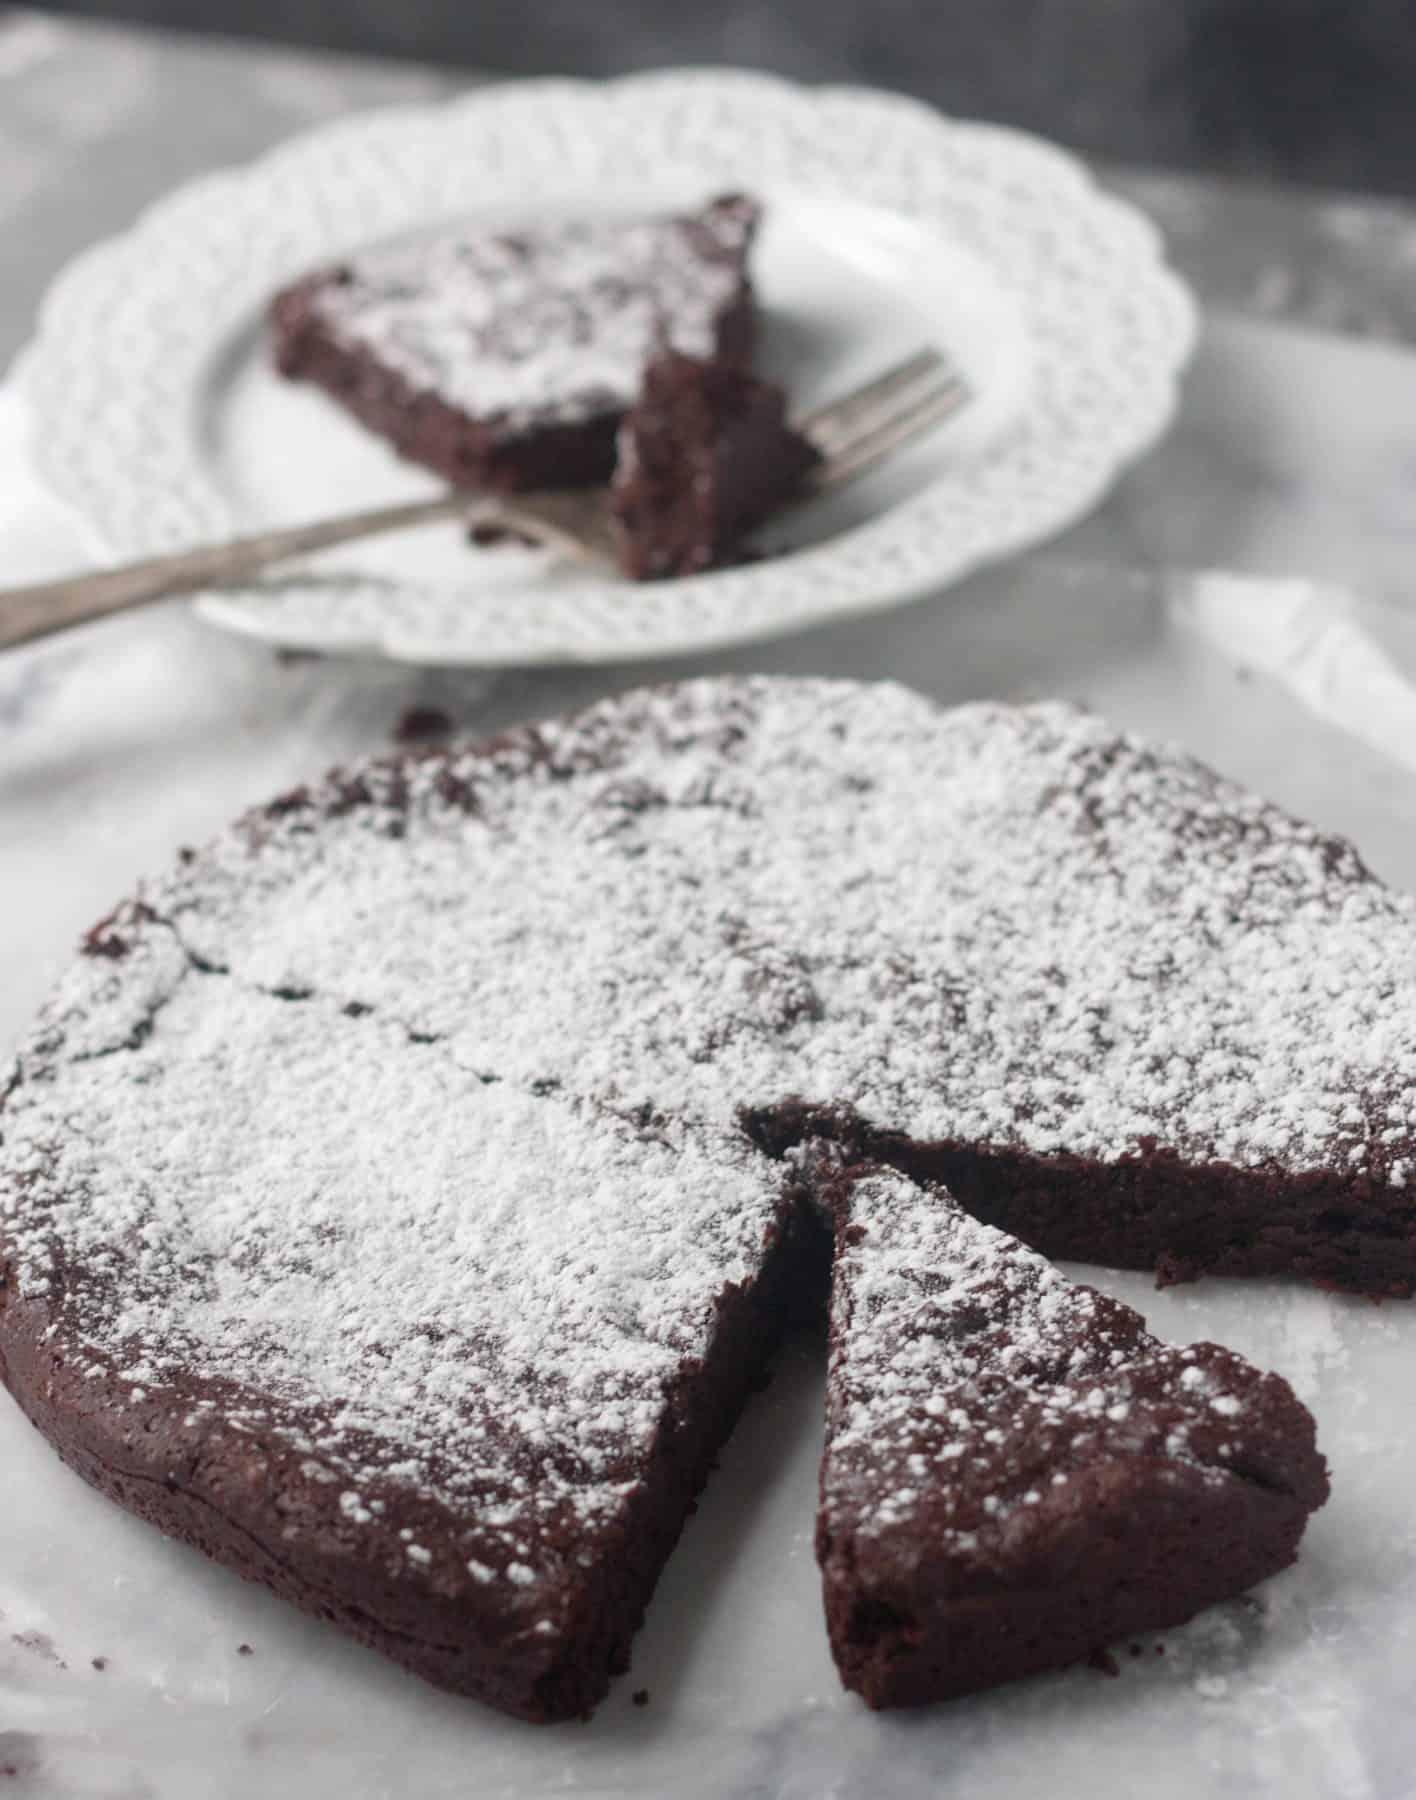 6-Ingredient Flourless Chocolate Espresso Cake